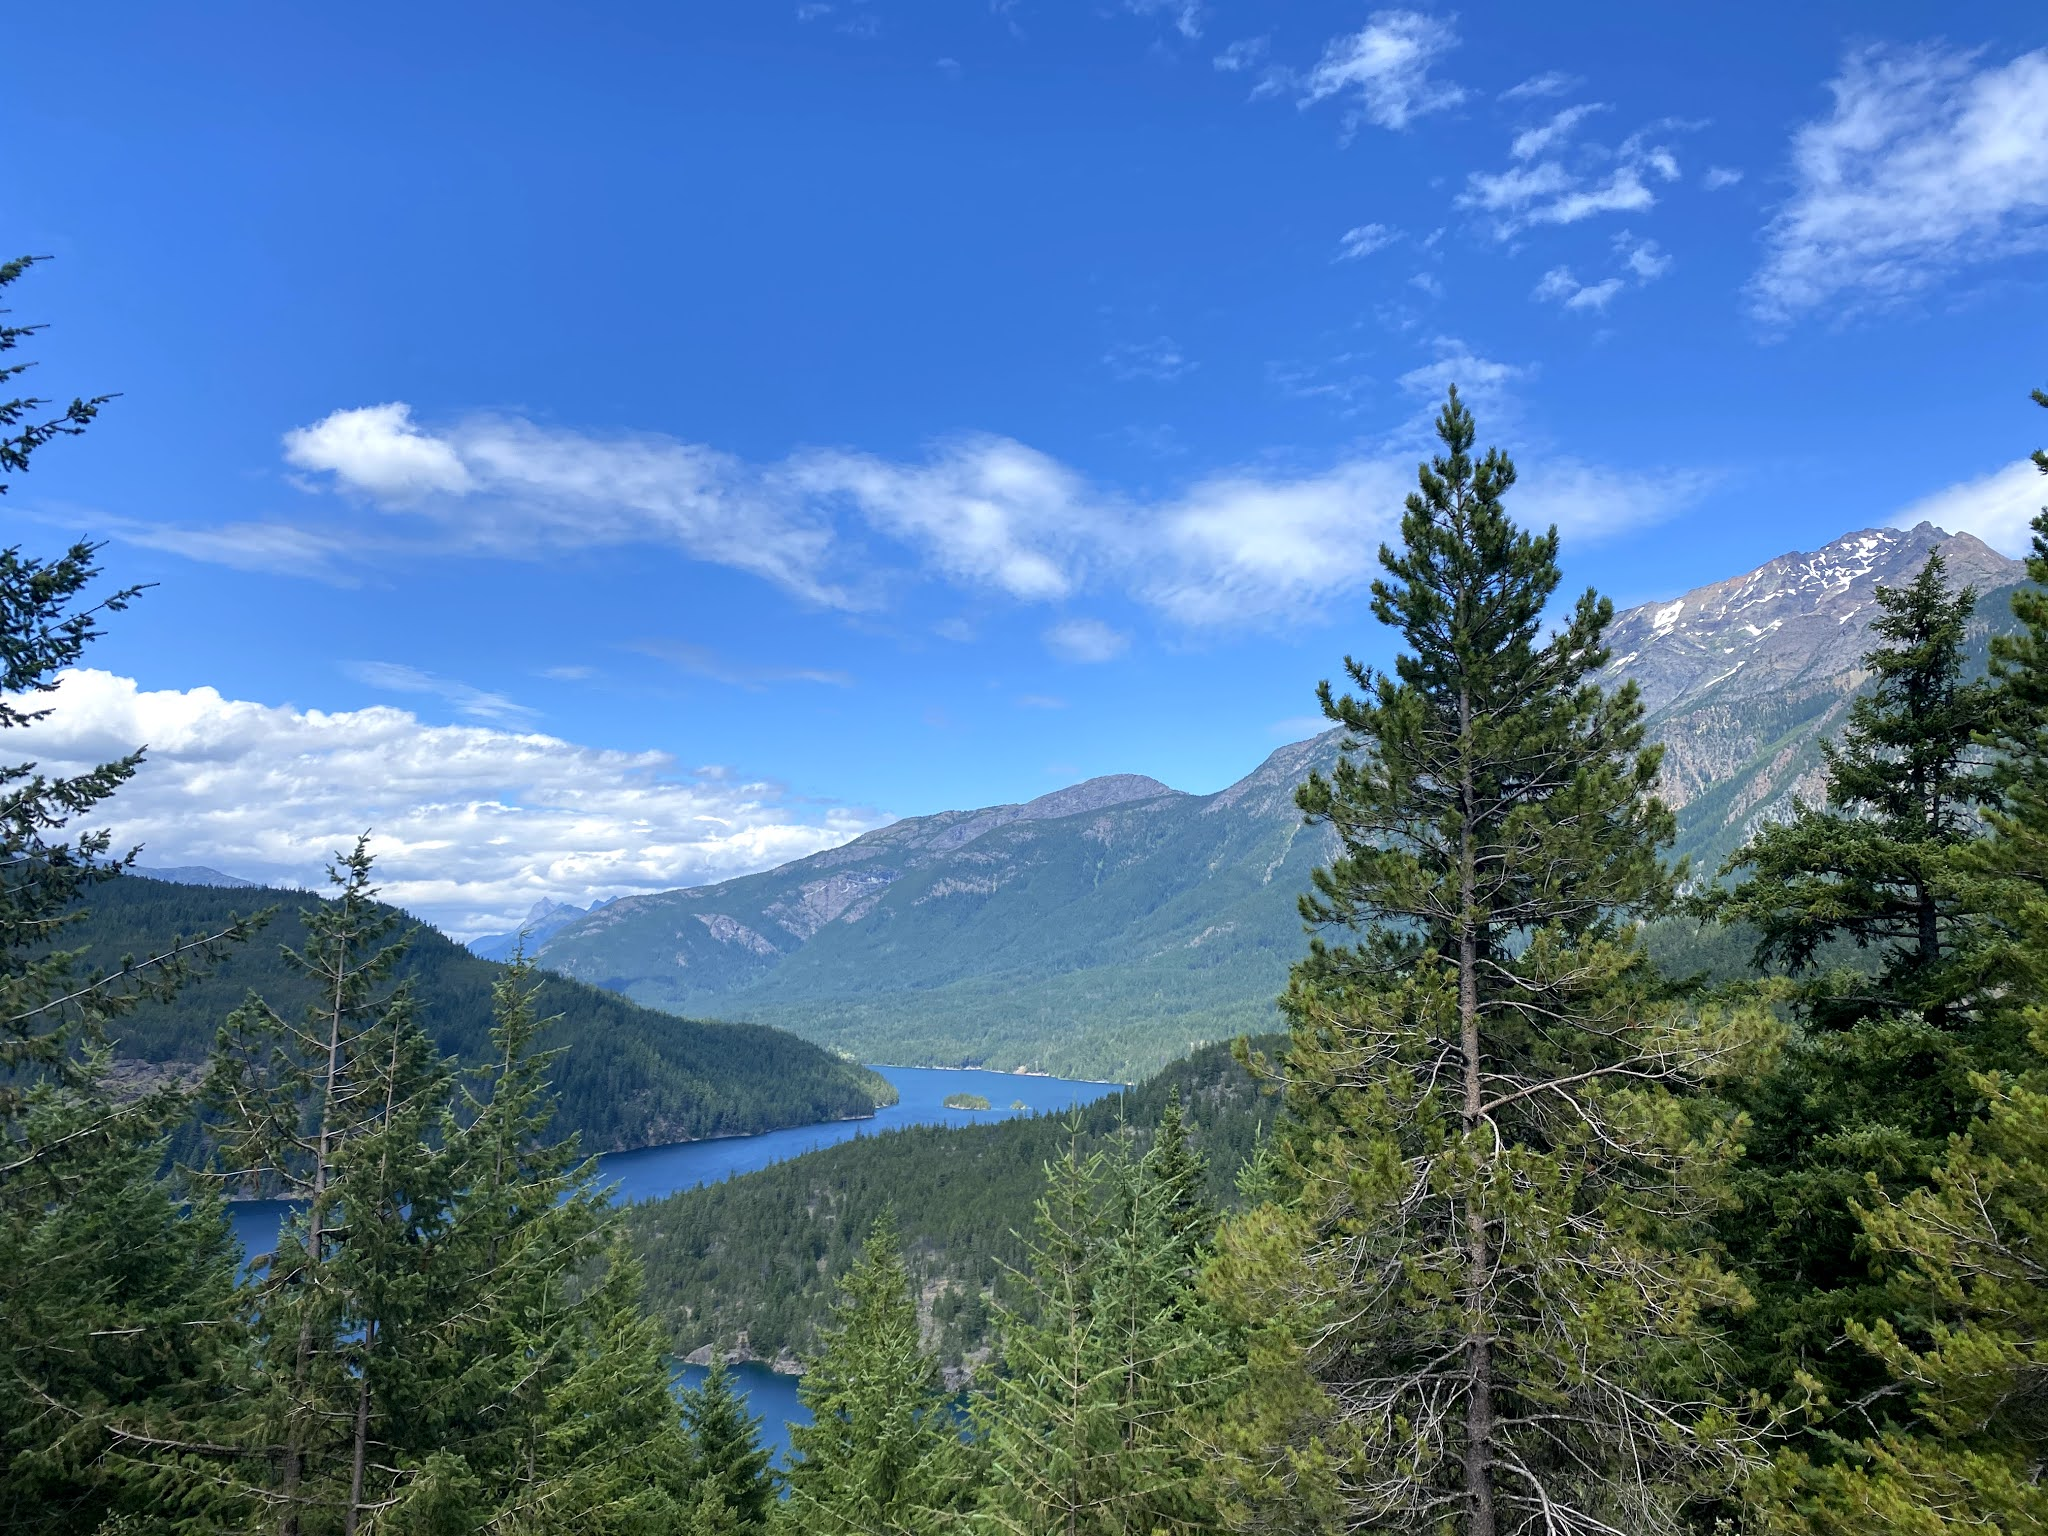 The Cascades | biblio-style.com